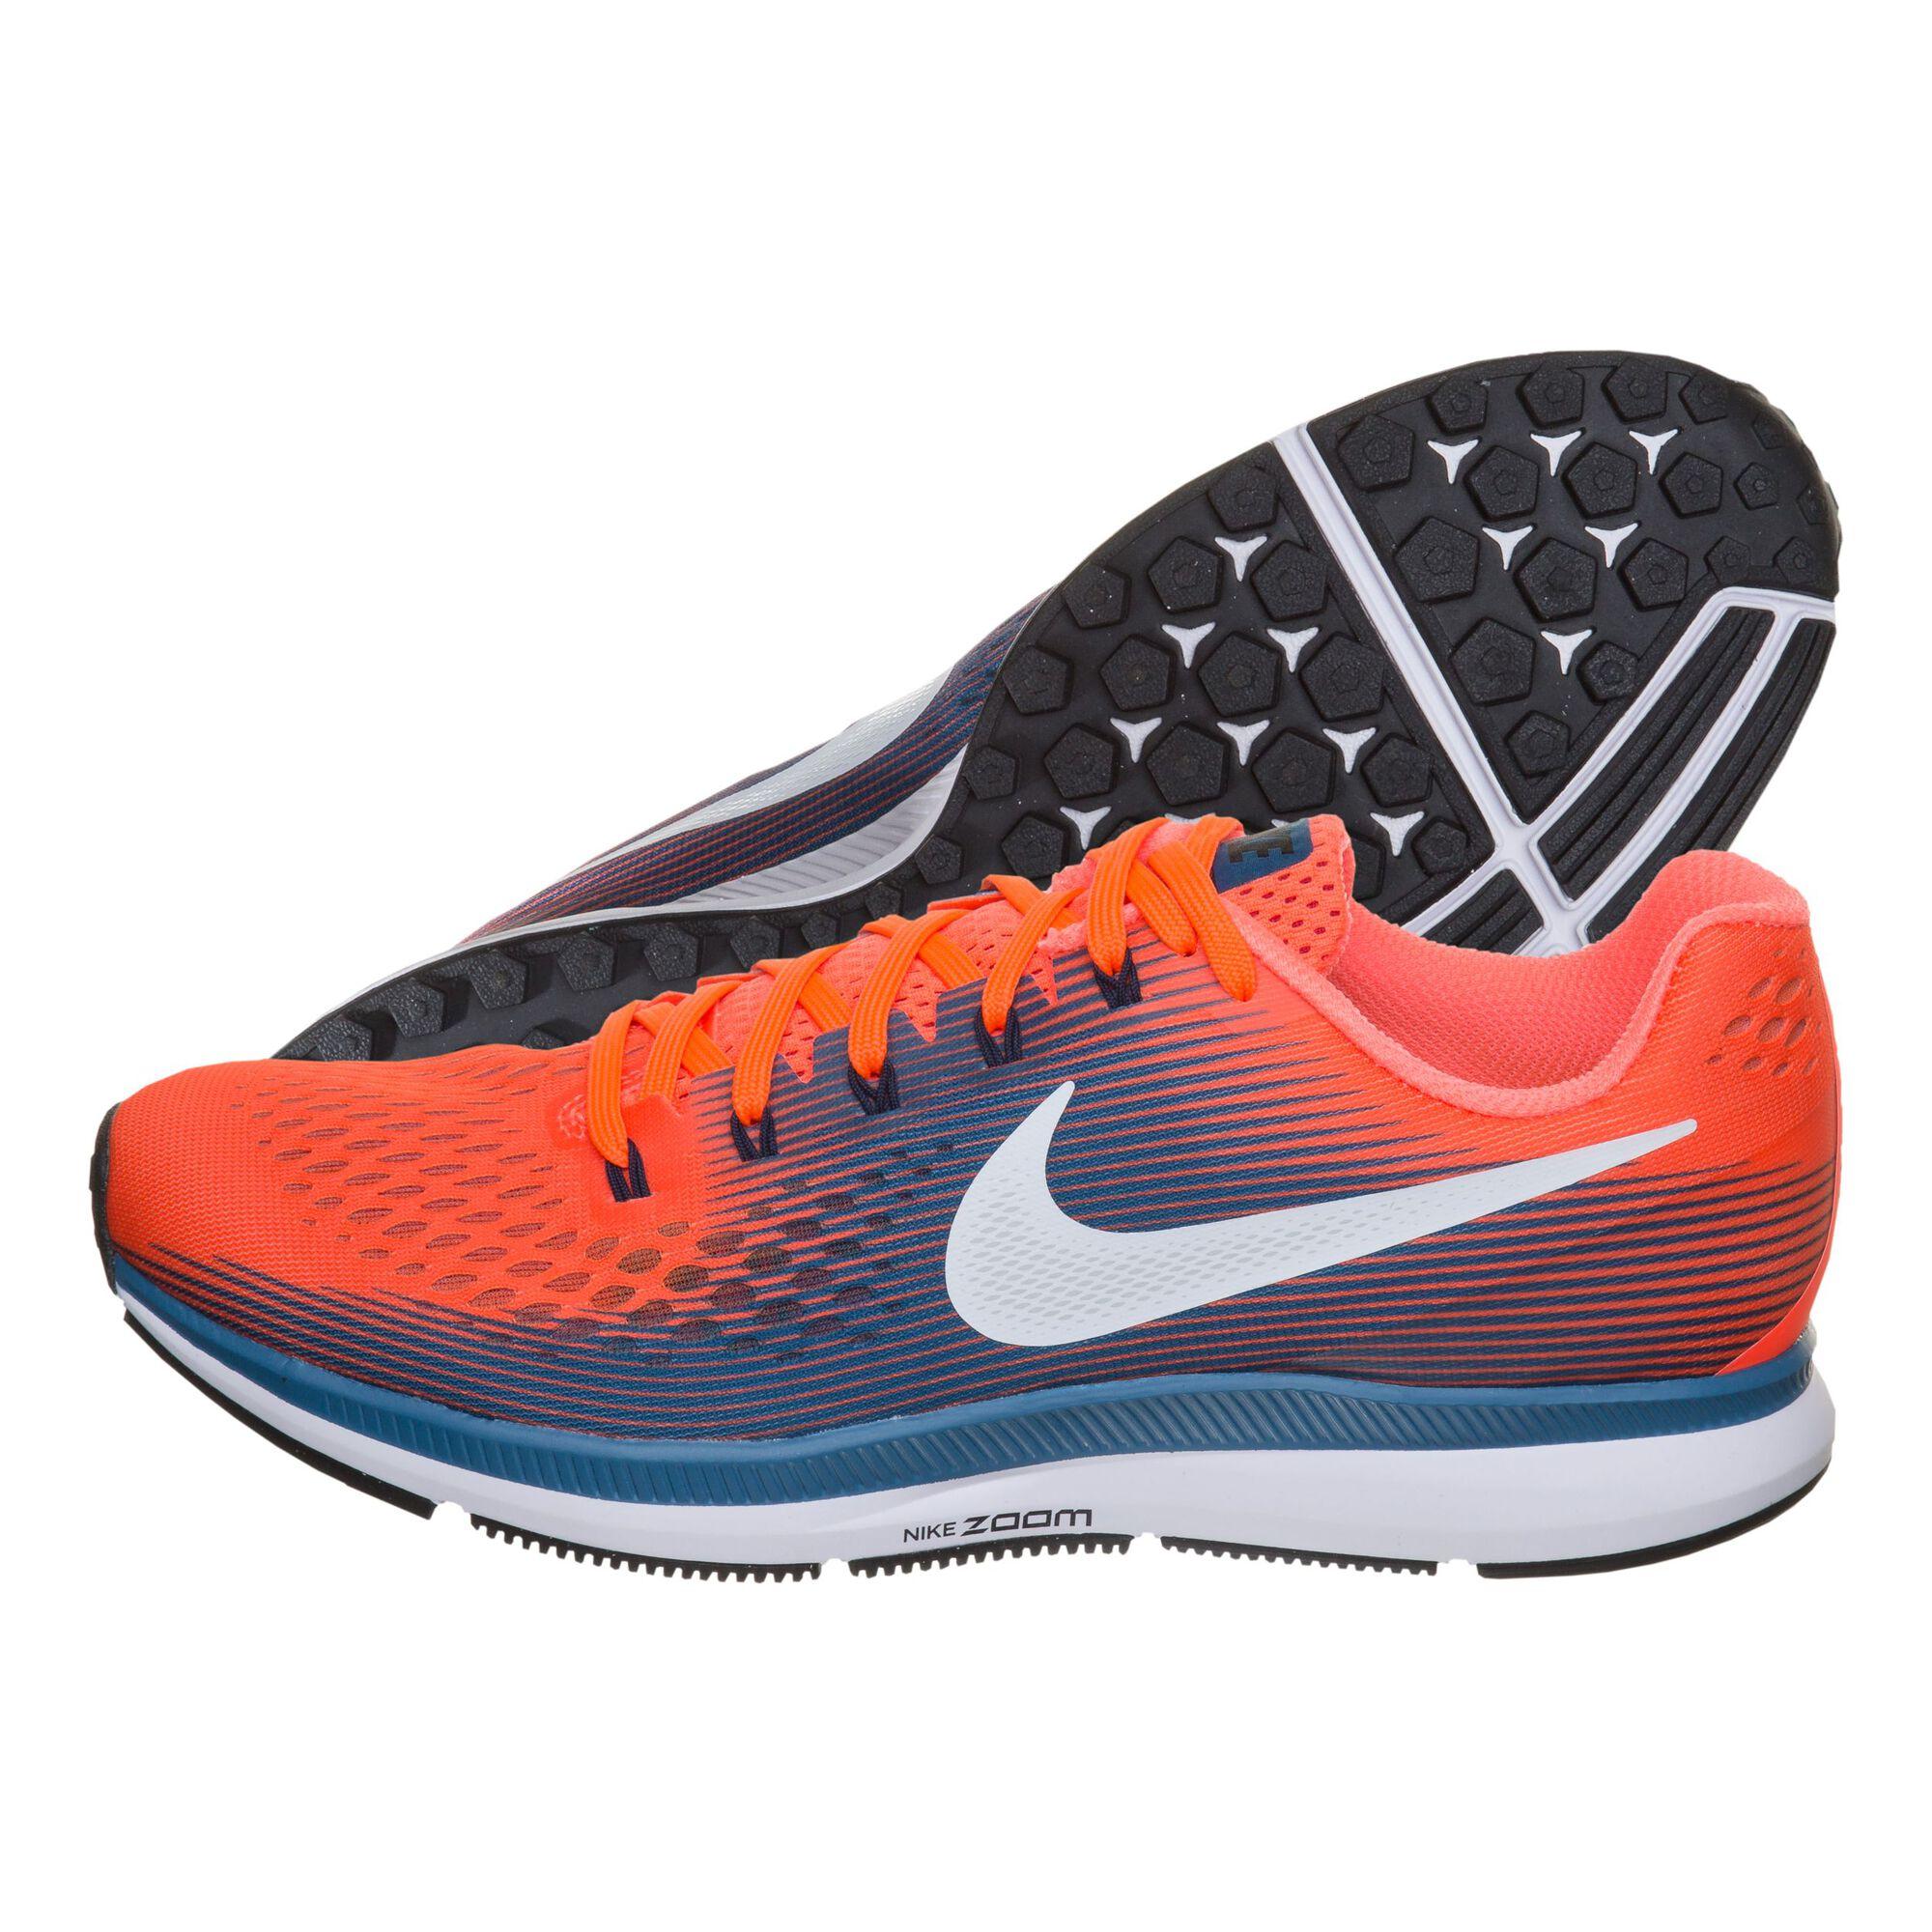 a84b9fda6de0 ... Nike  Nike  Nike  Nike  Nike  Nike. Air Zoom Pegasus 34 ...